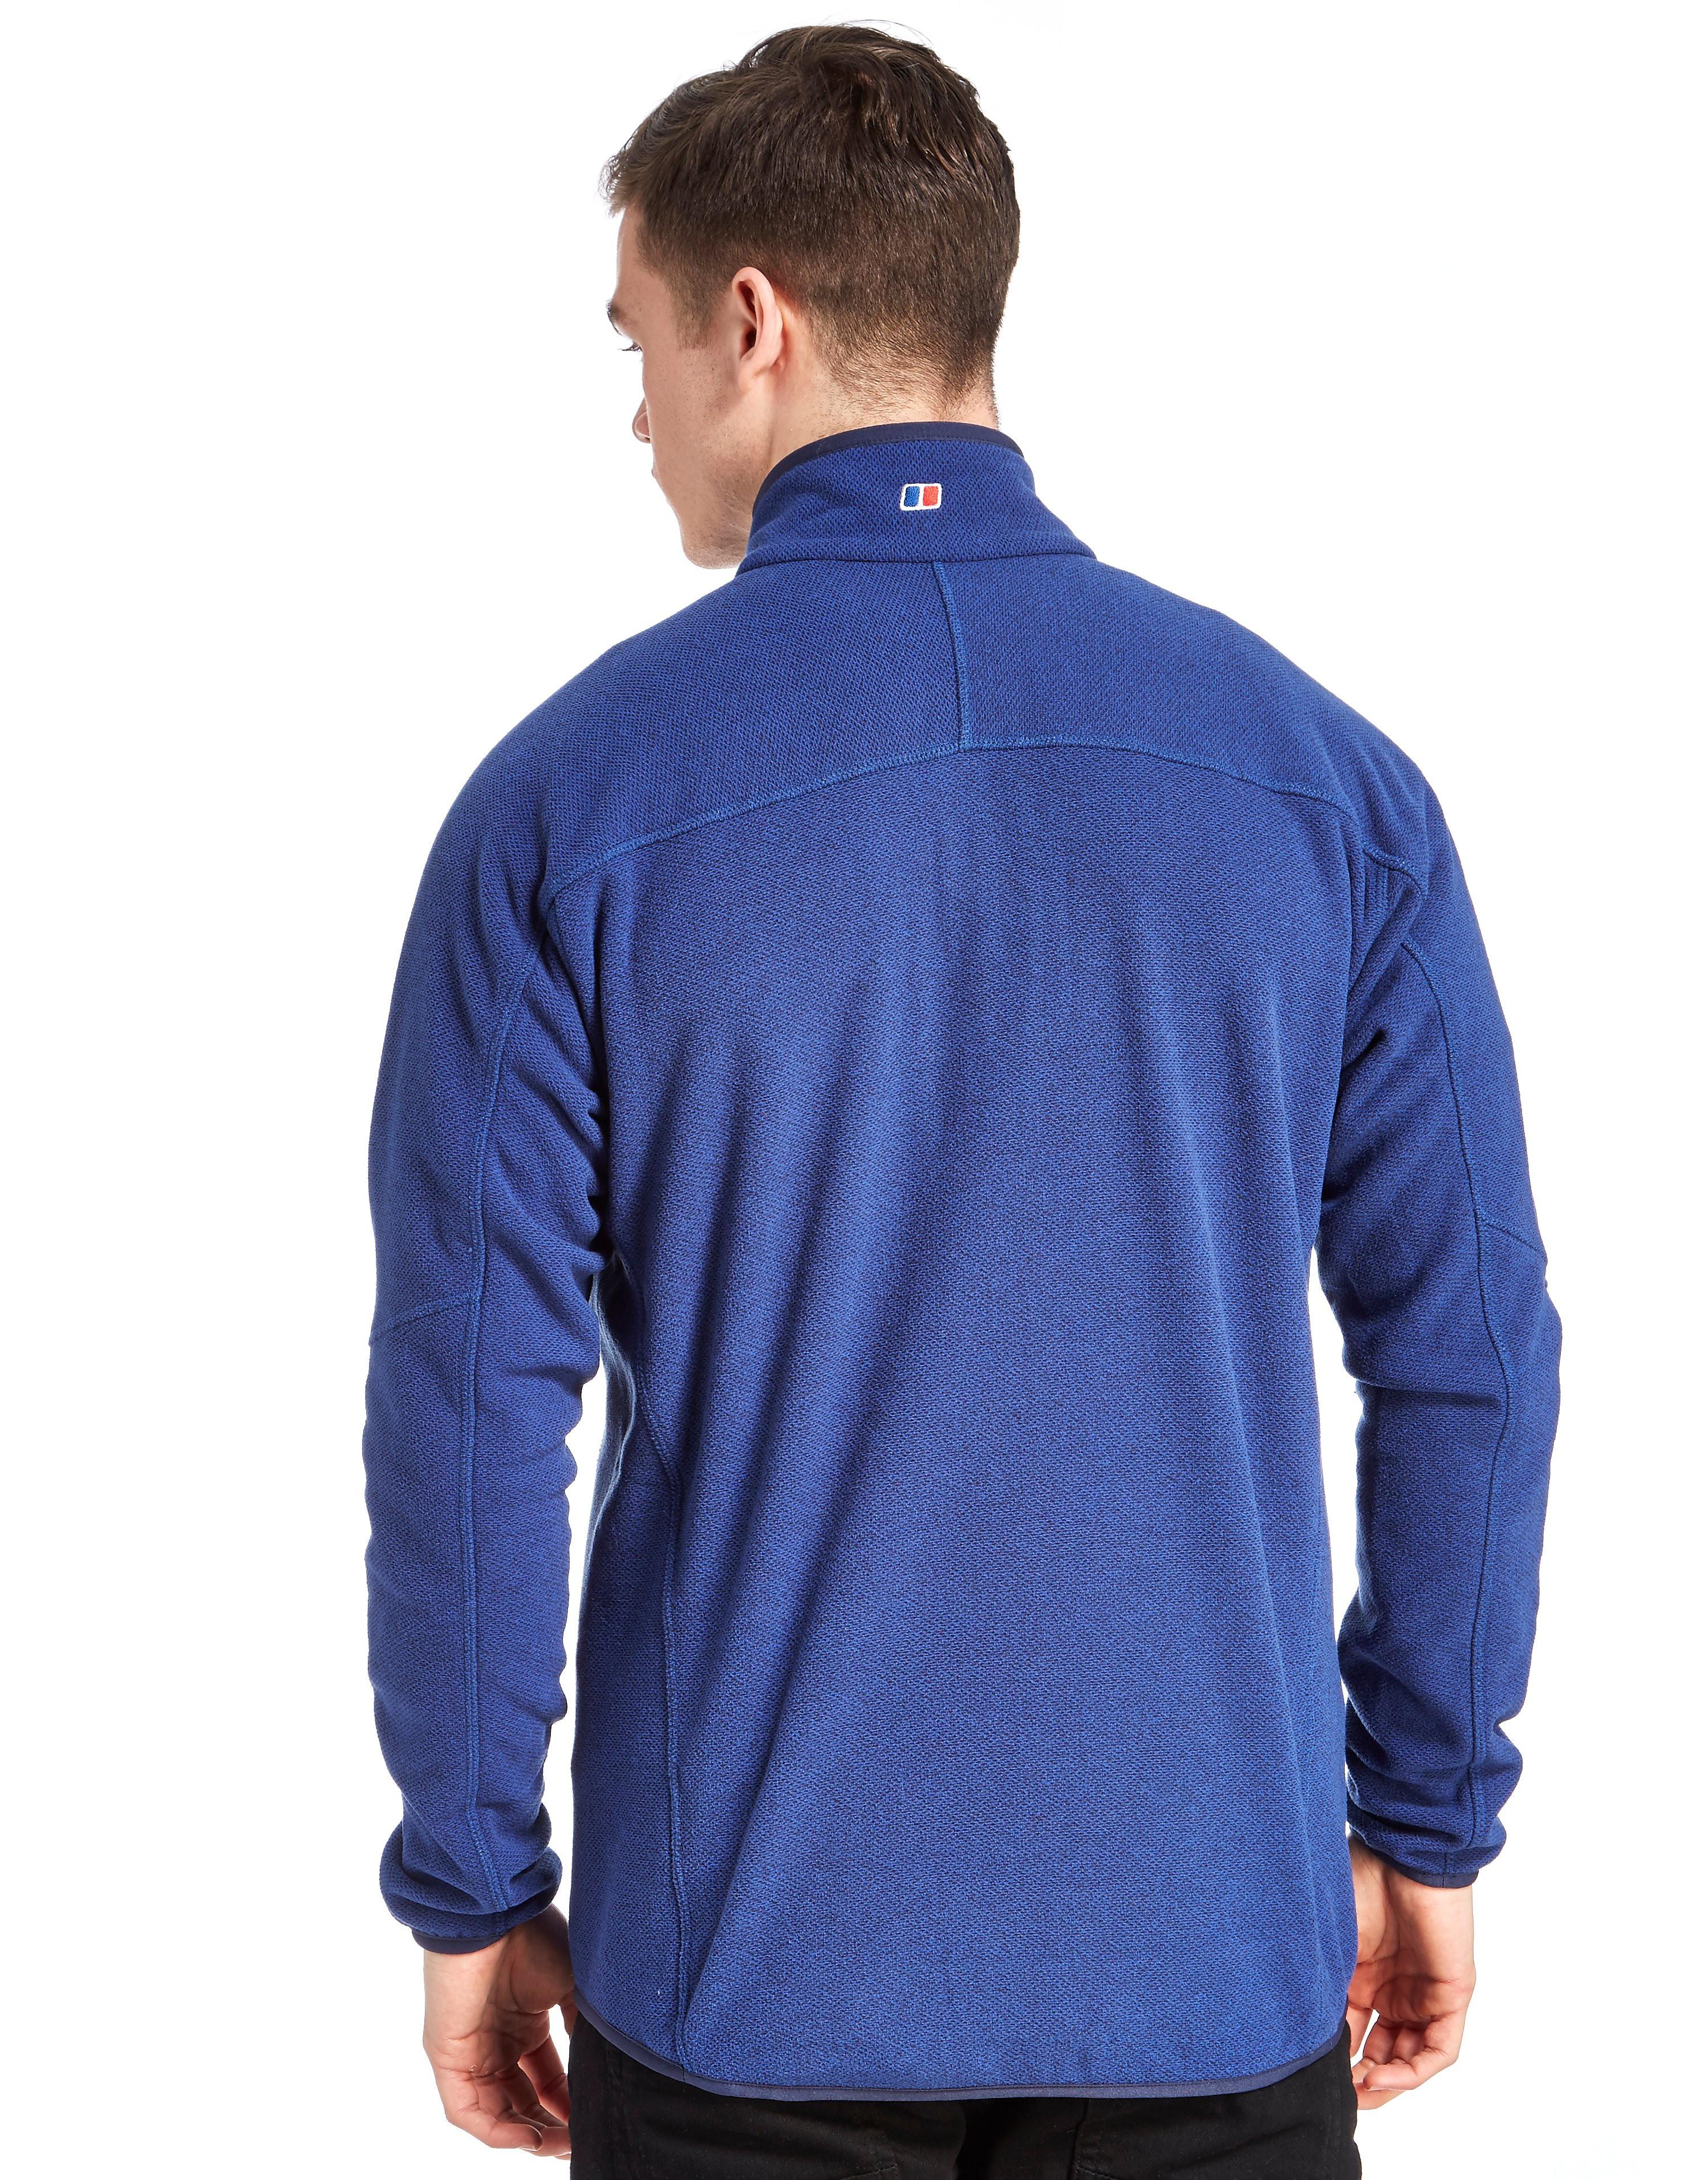 Berghaus Stainton Half Zip Midlayer Jacket